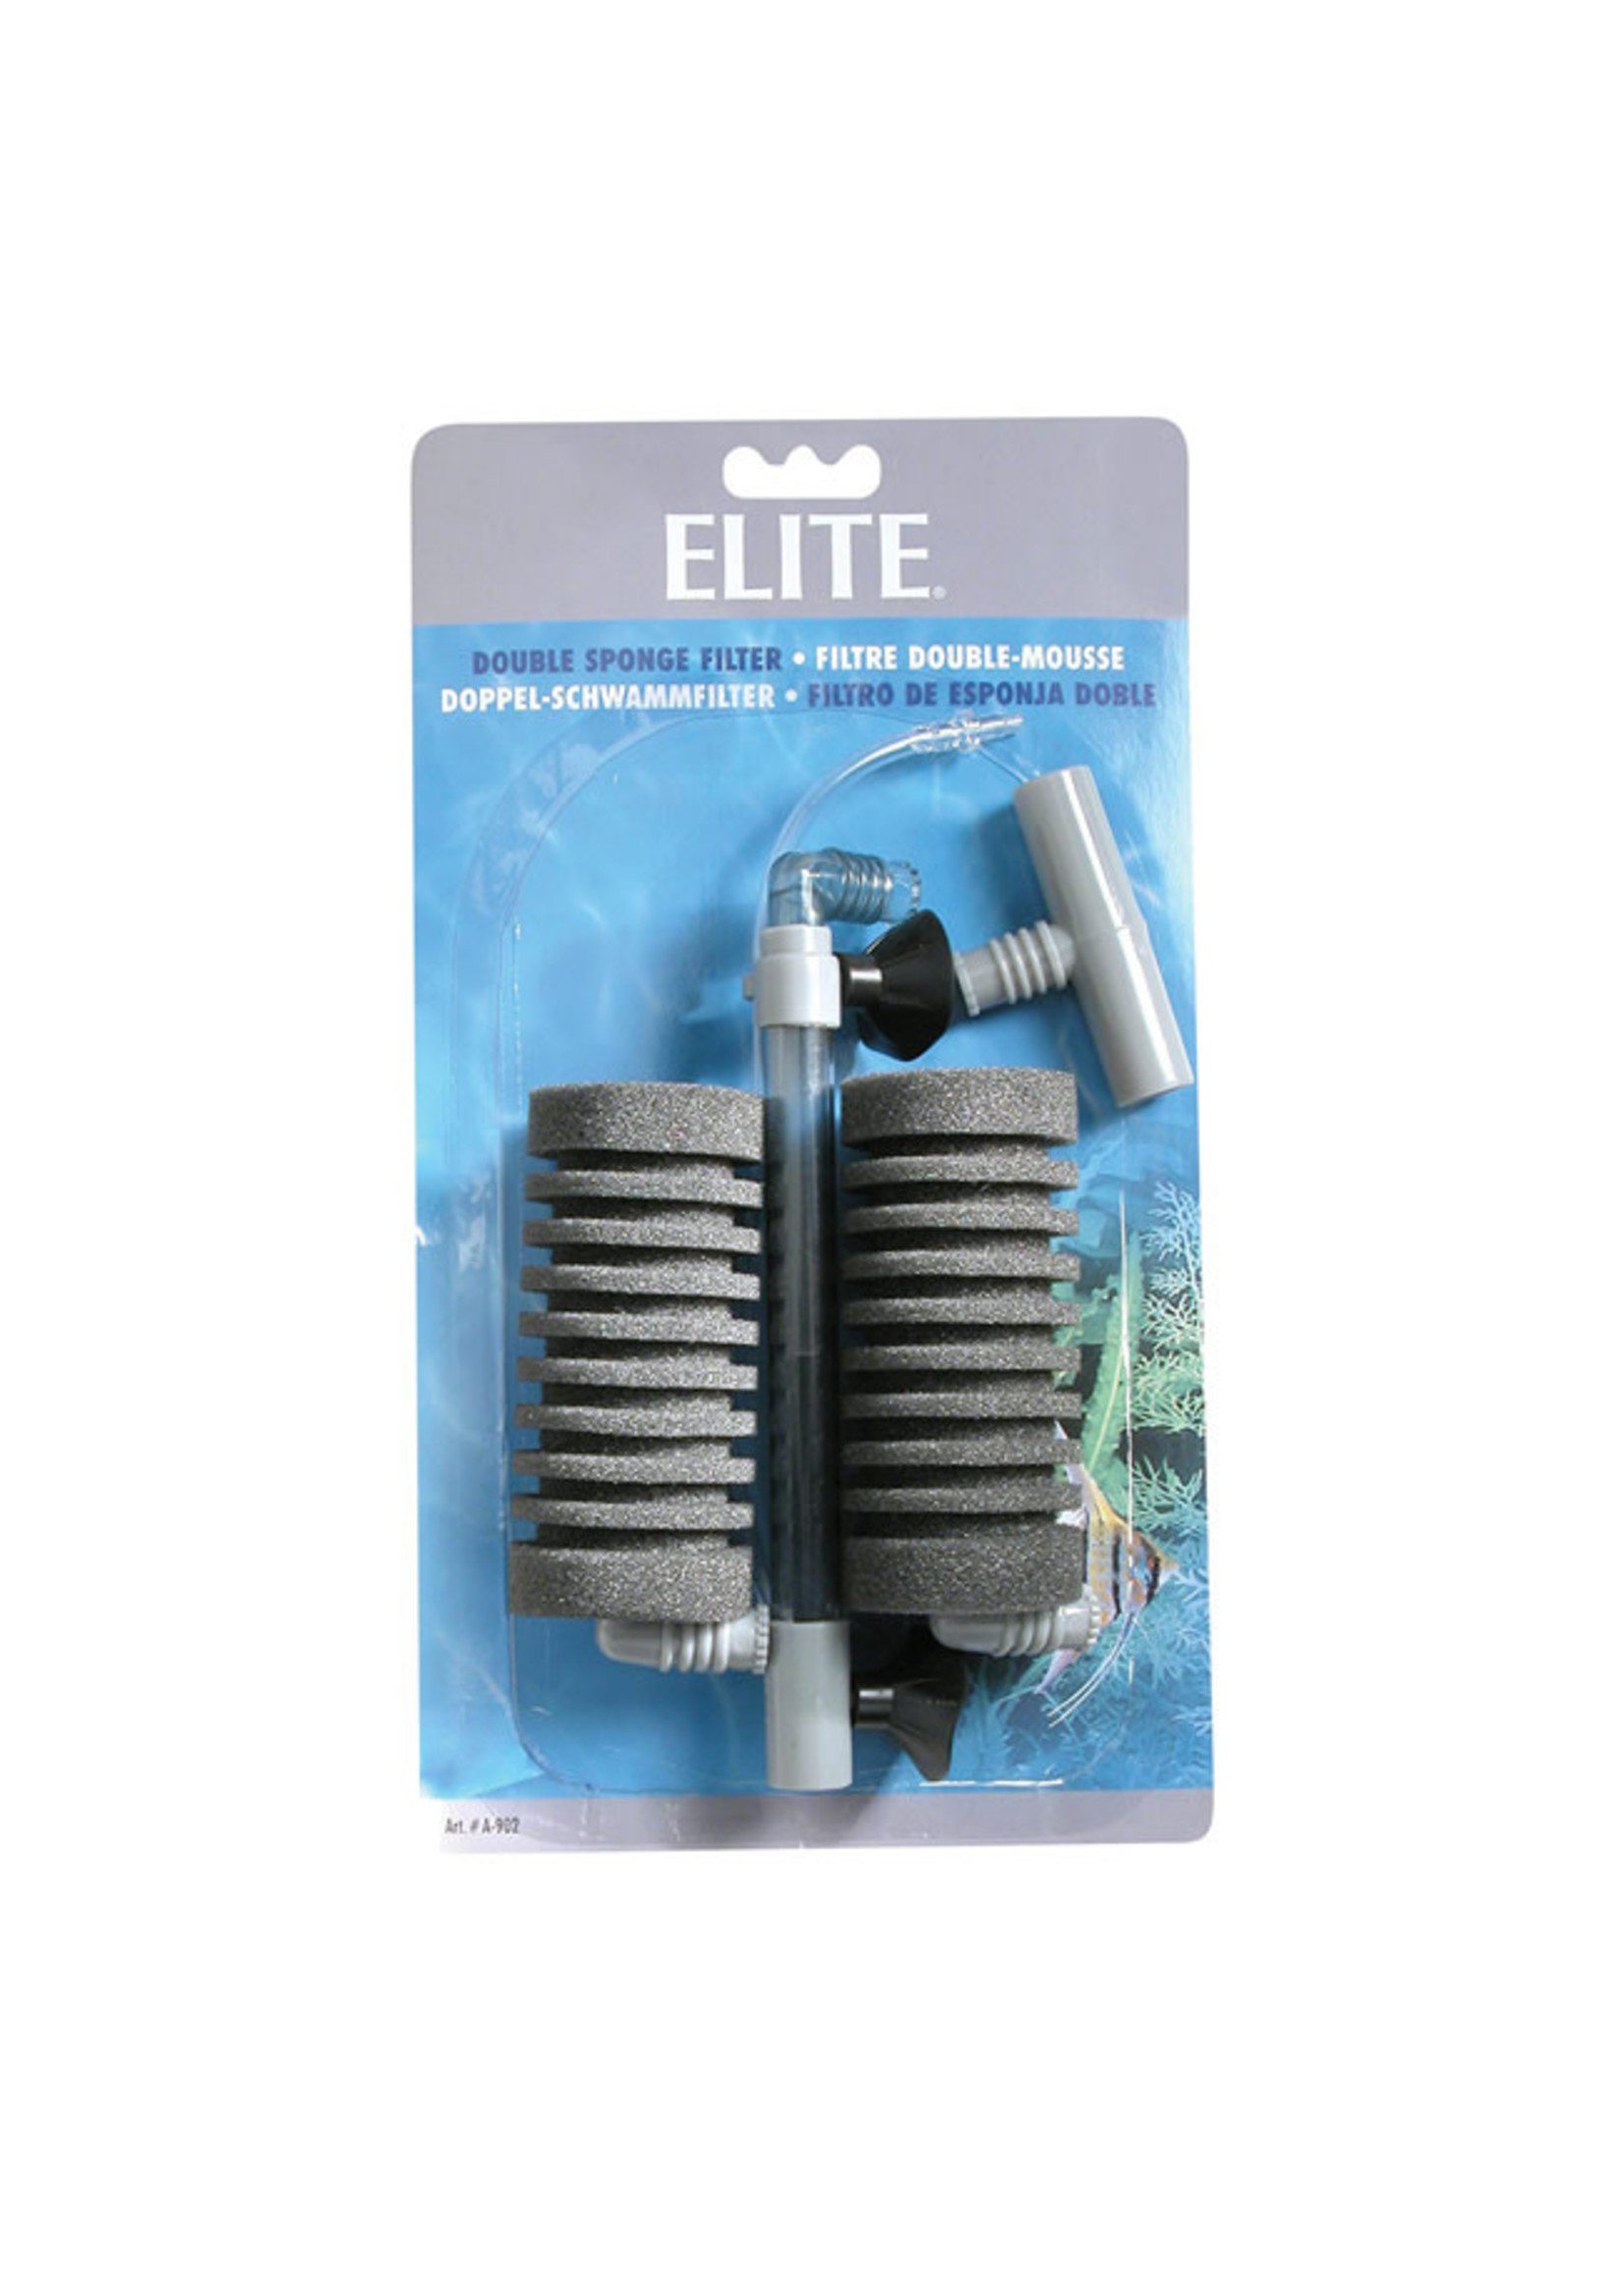 Elite Elite Double Sponge Filter